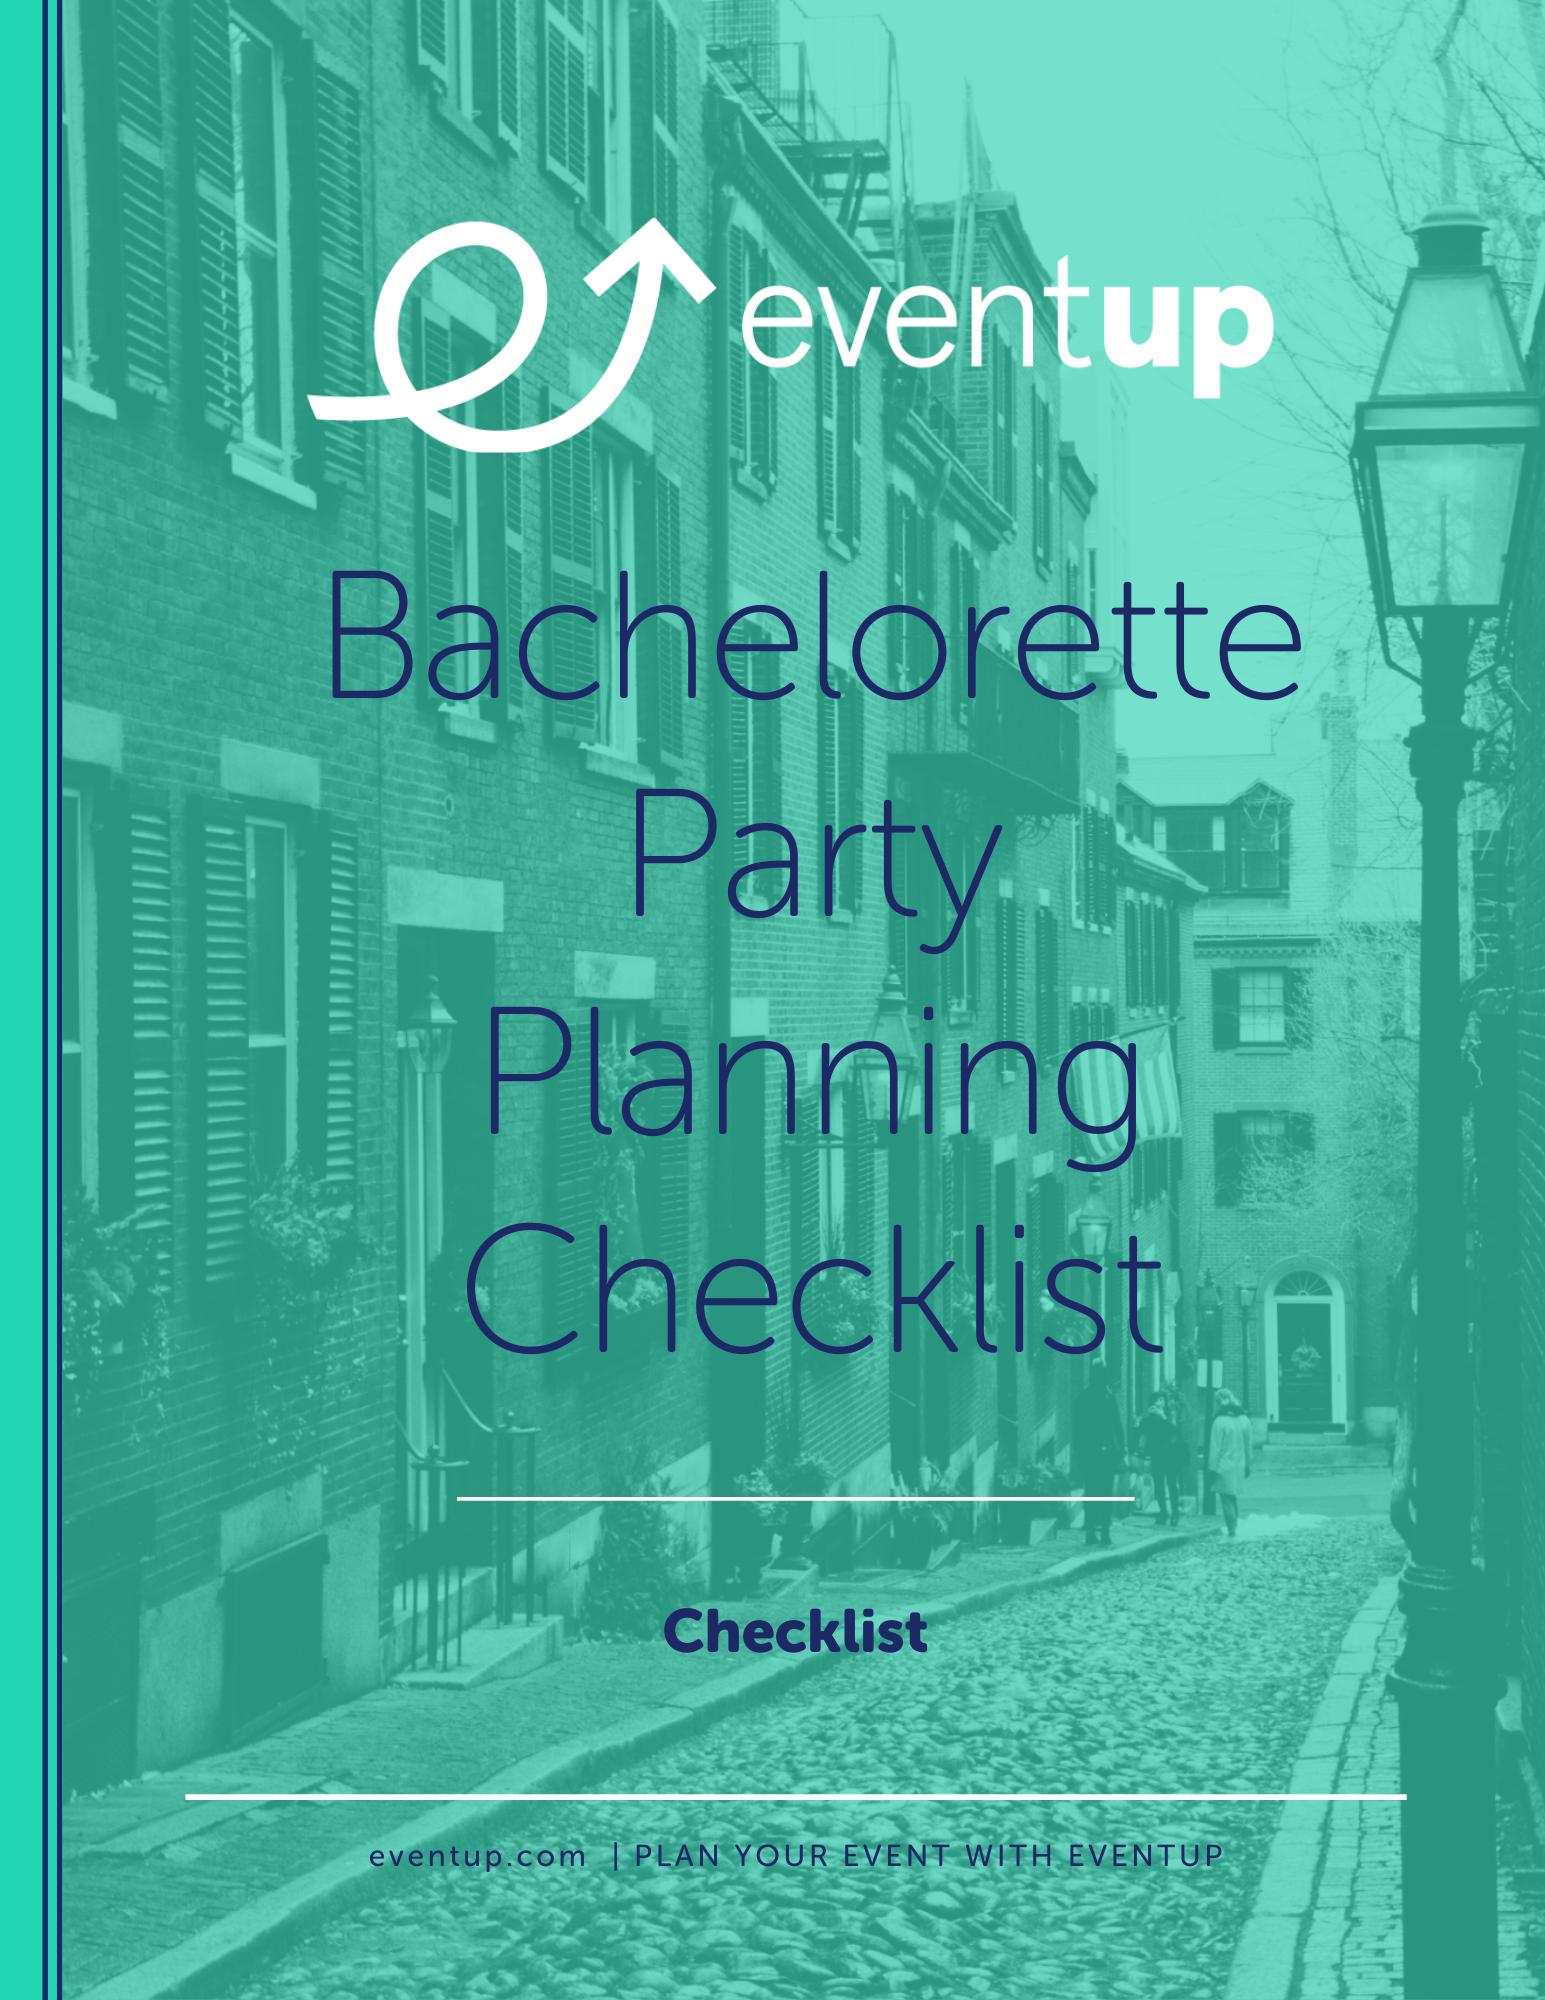 EventUp - Bachelorette Party Planning Checklist